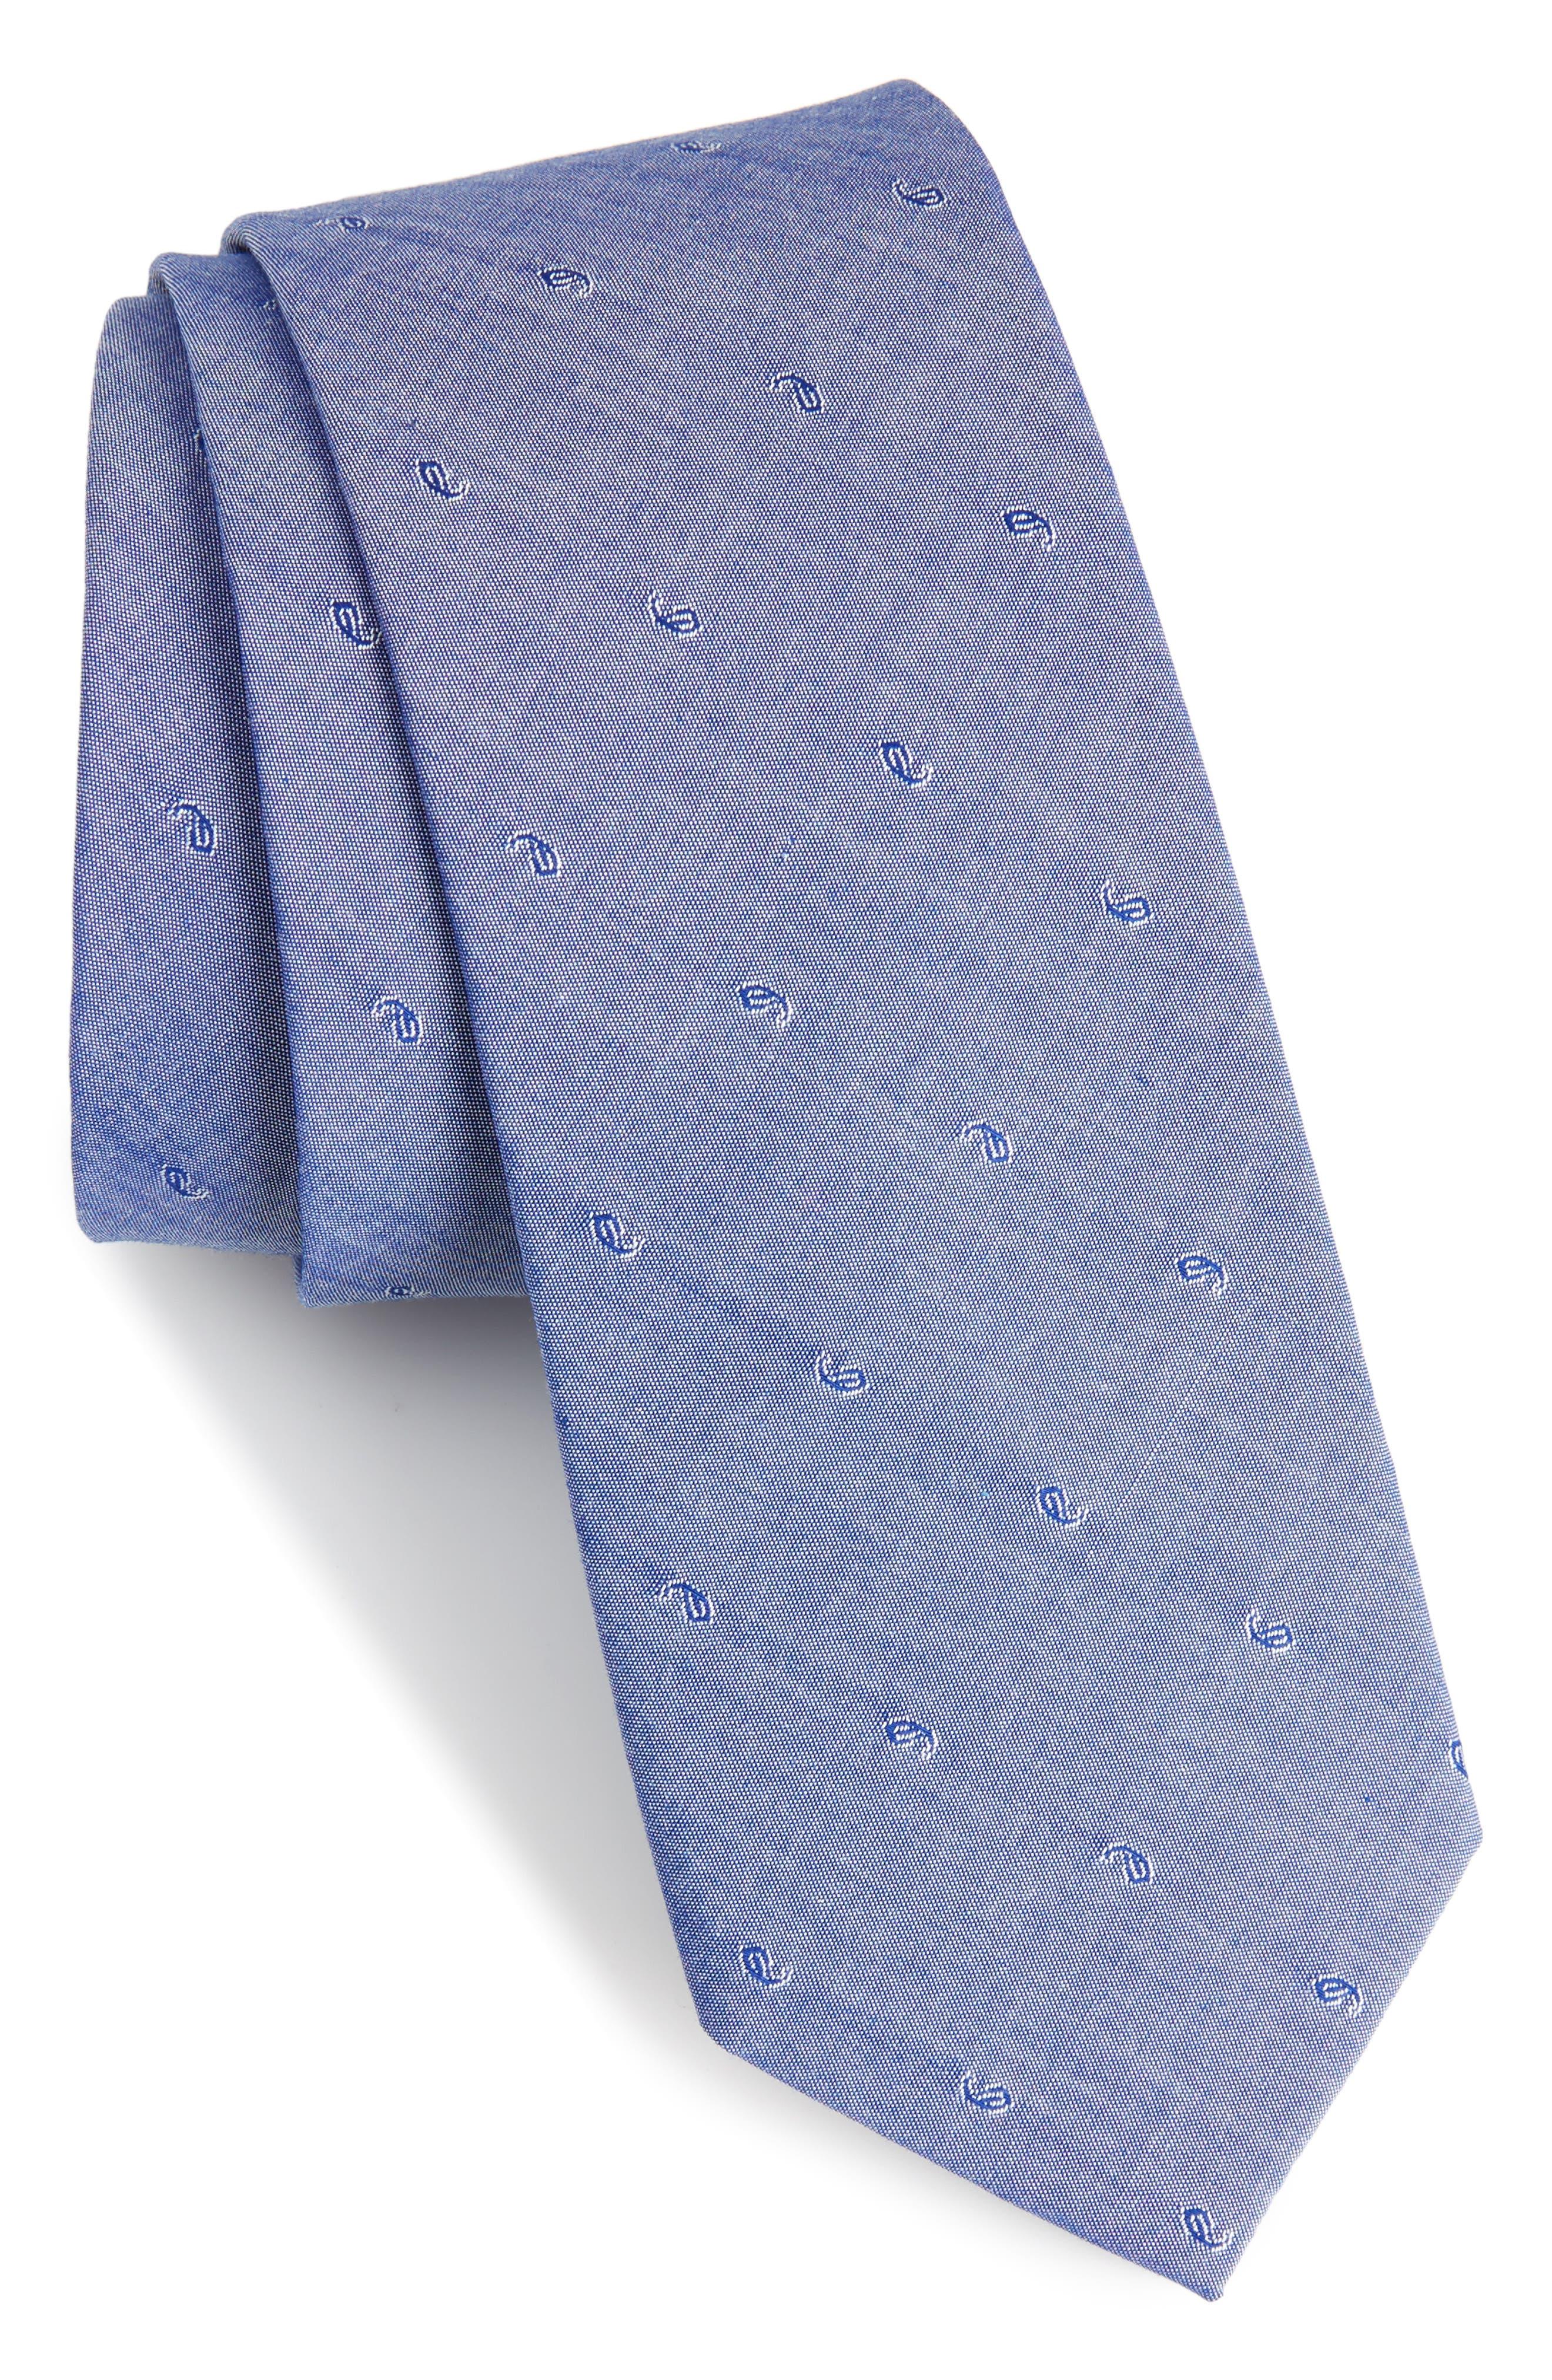 Indigo Pine Cotton Skinny Tie,                         Main,                         color, 400